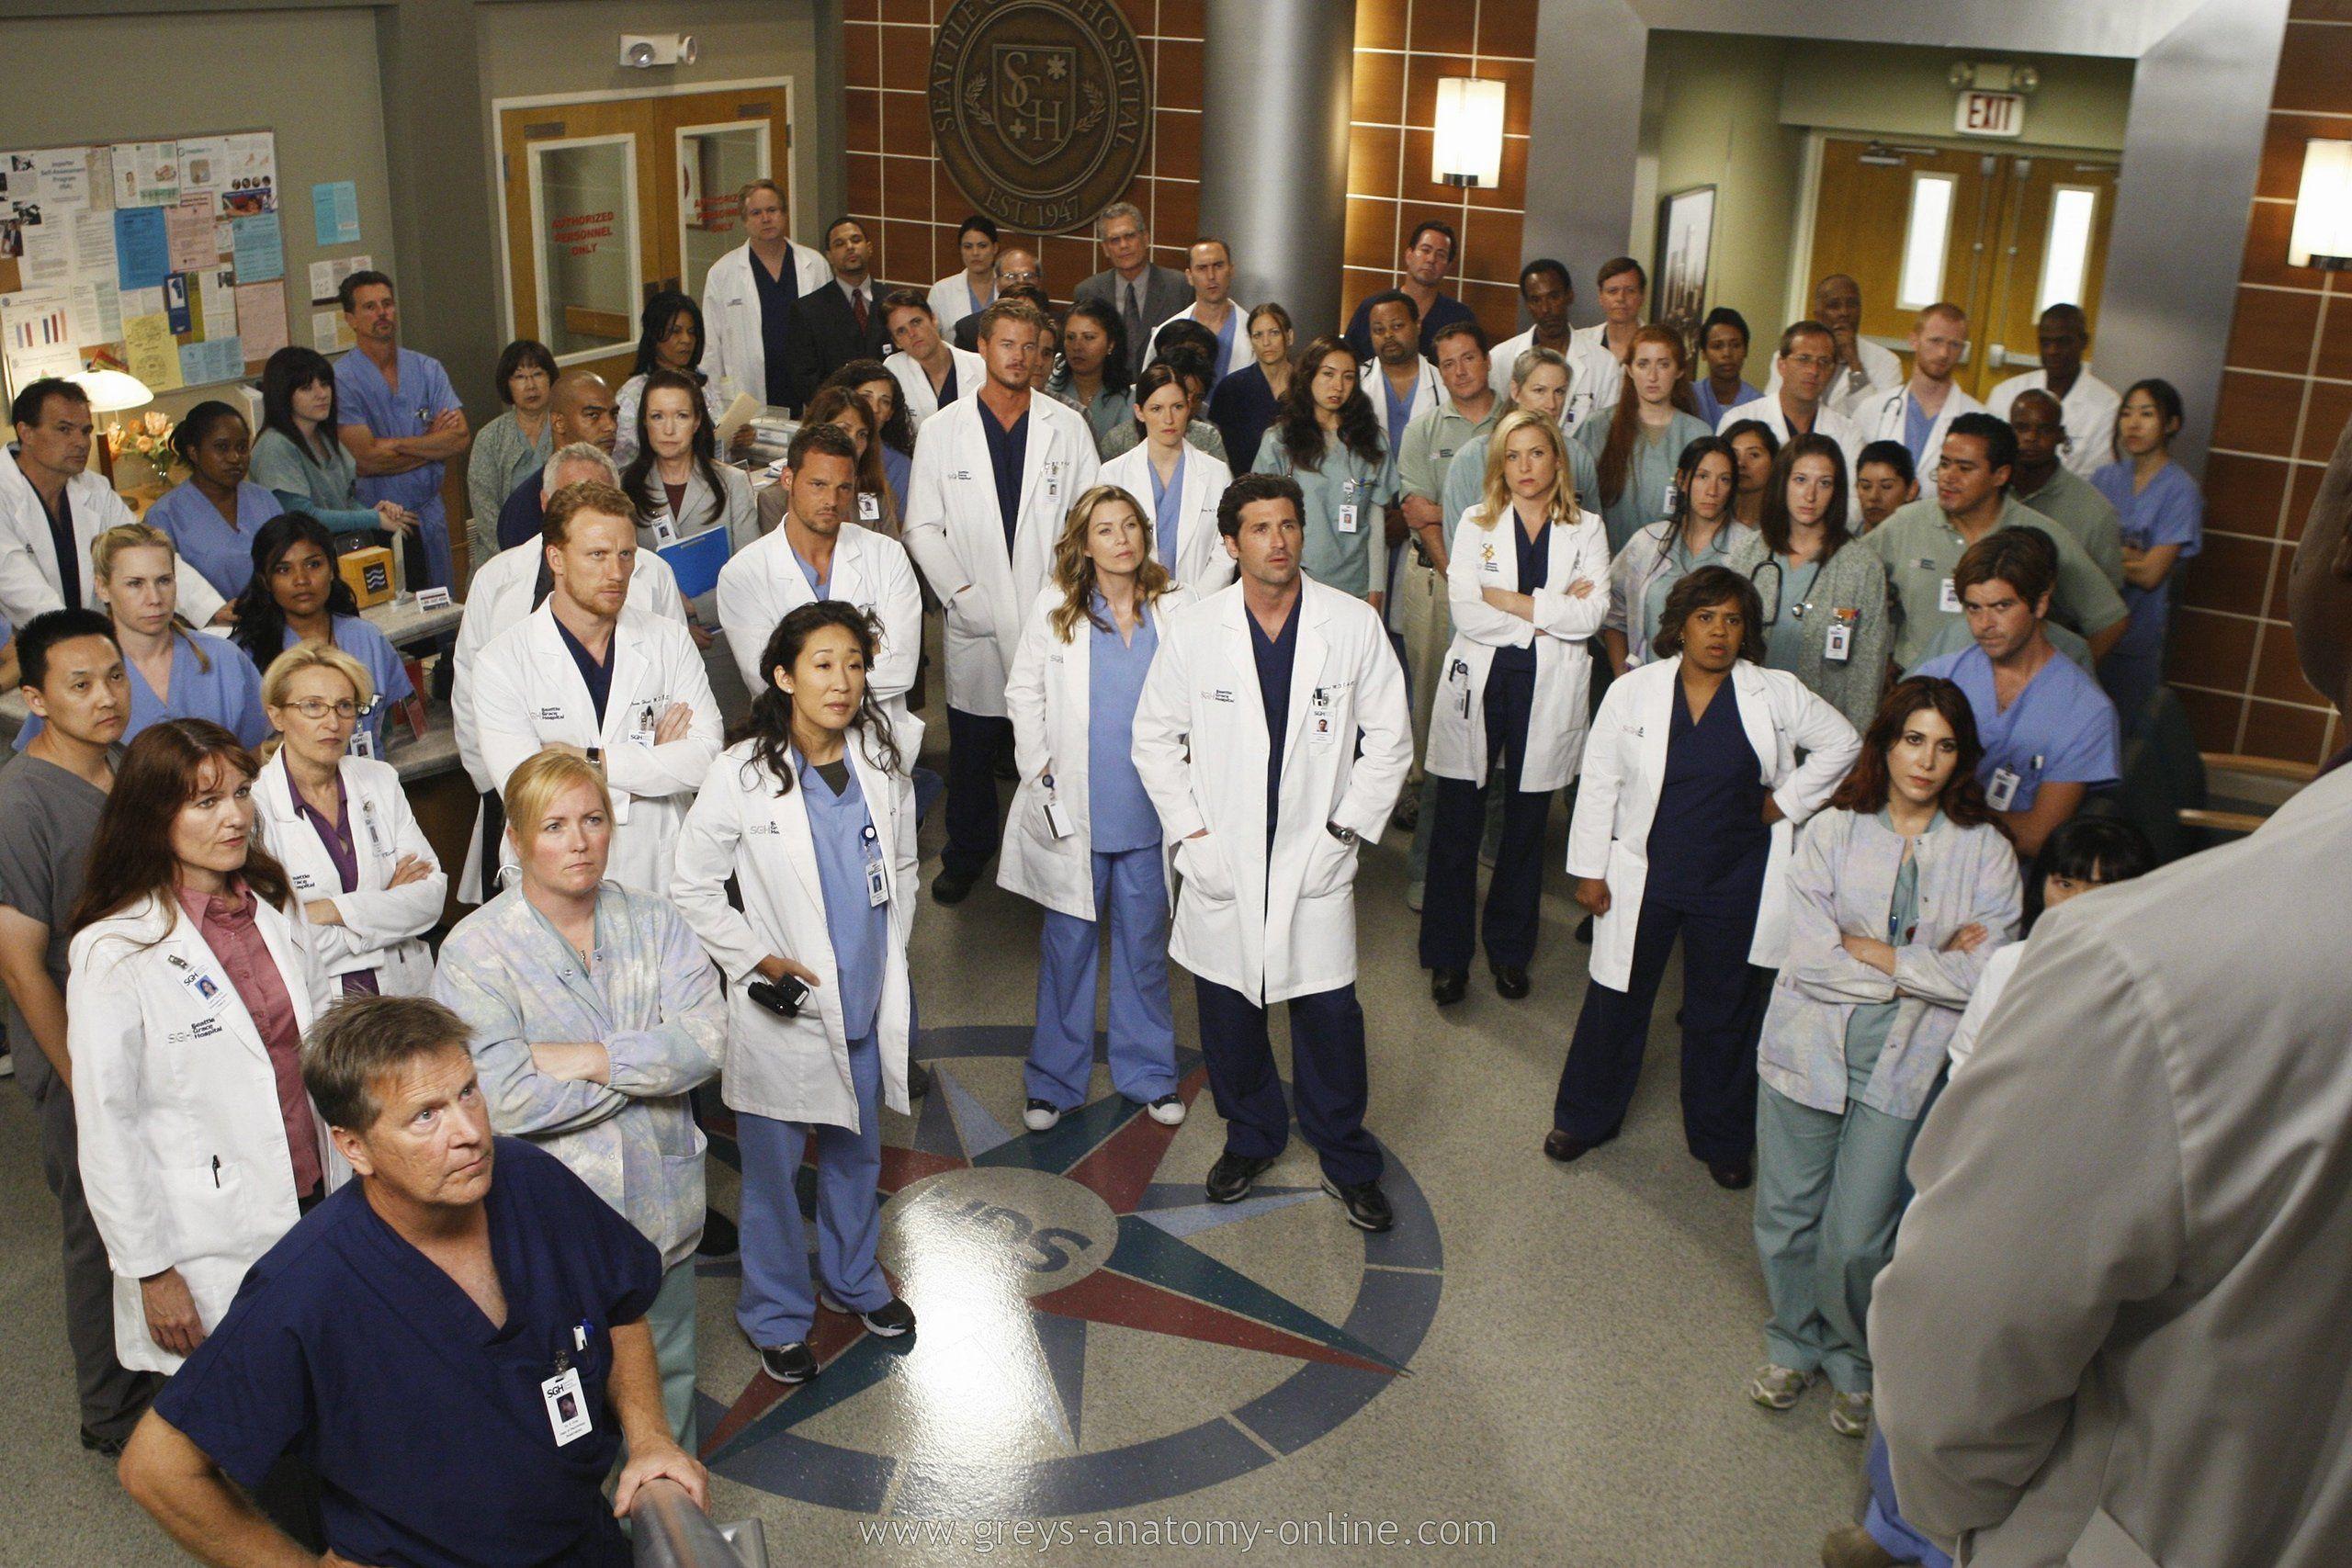 Greys Anatomy Still A Great Medical Drama Telly Pinterest